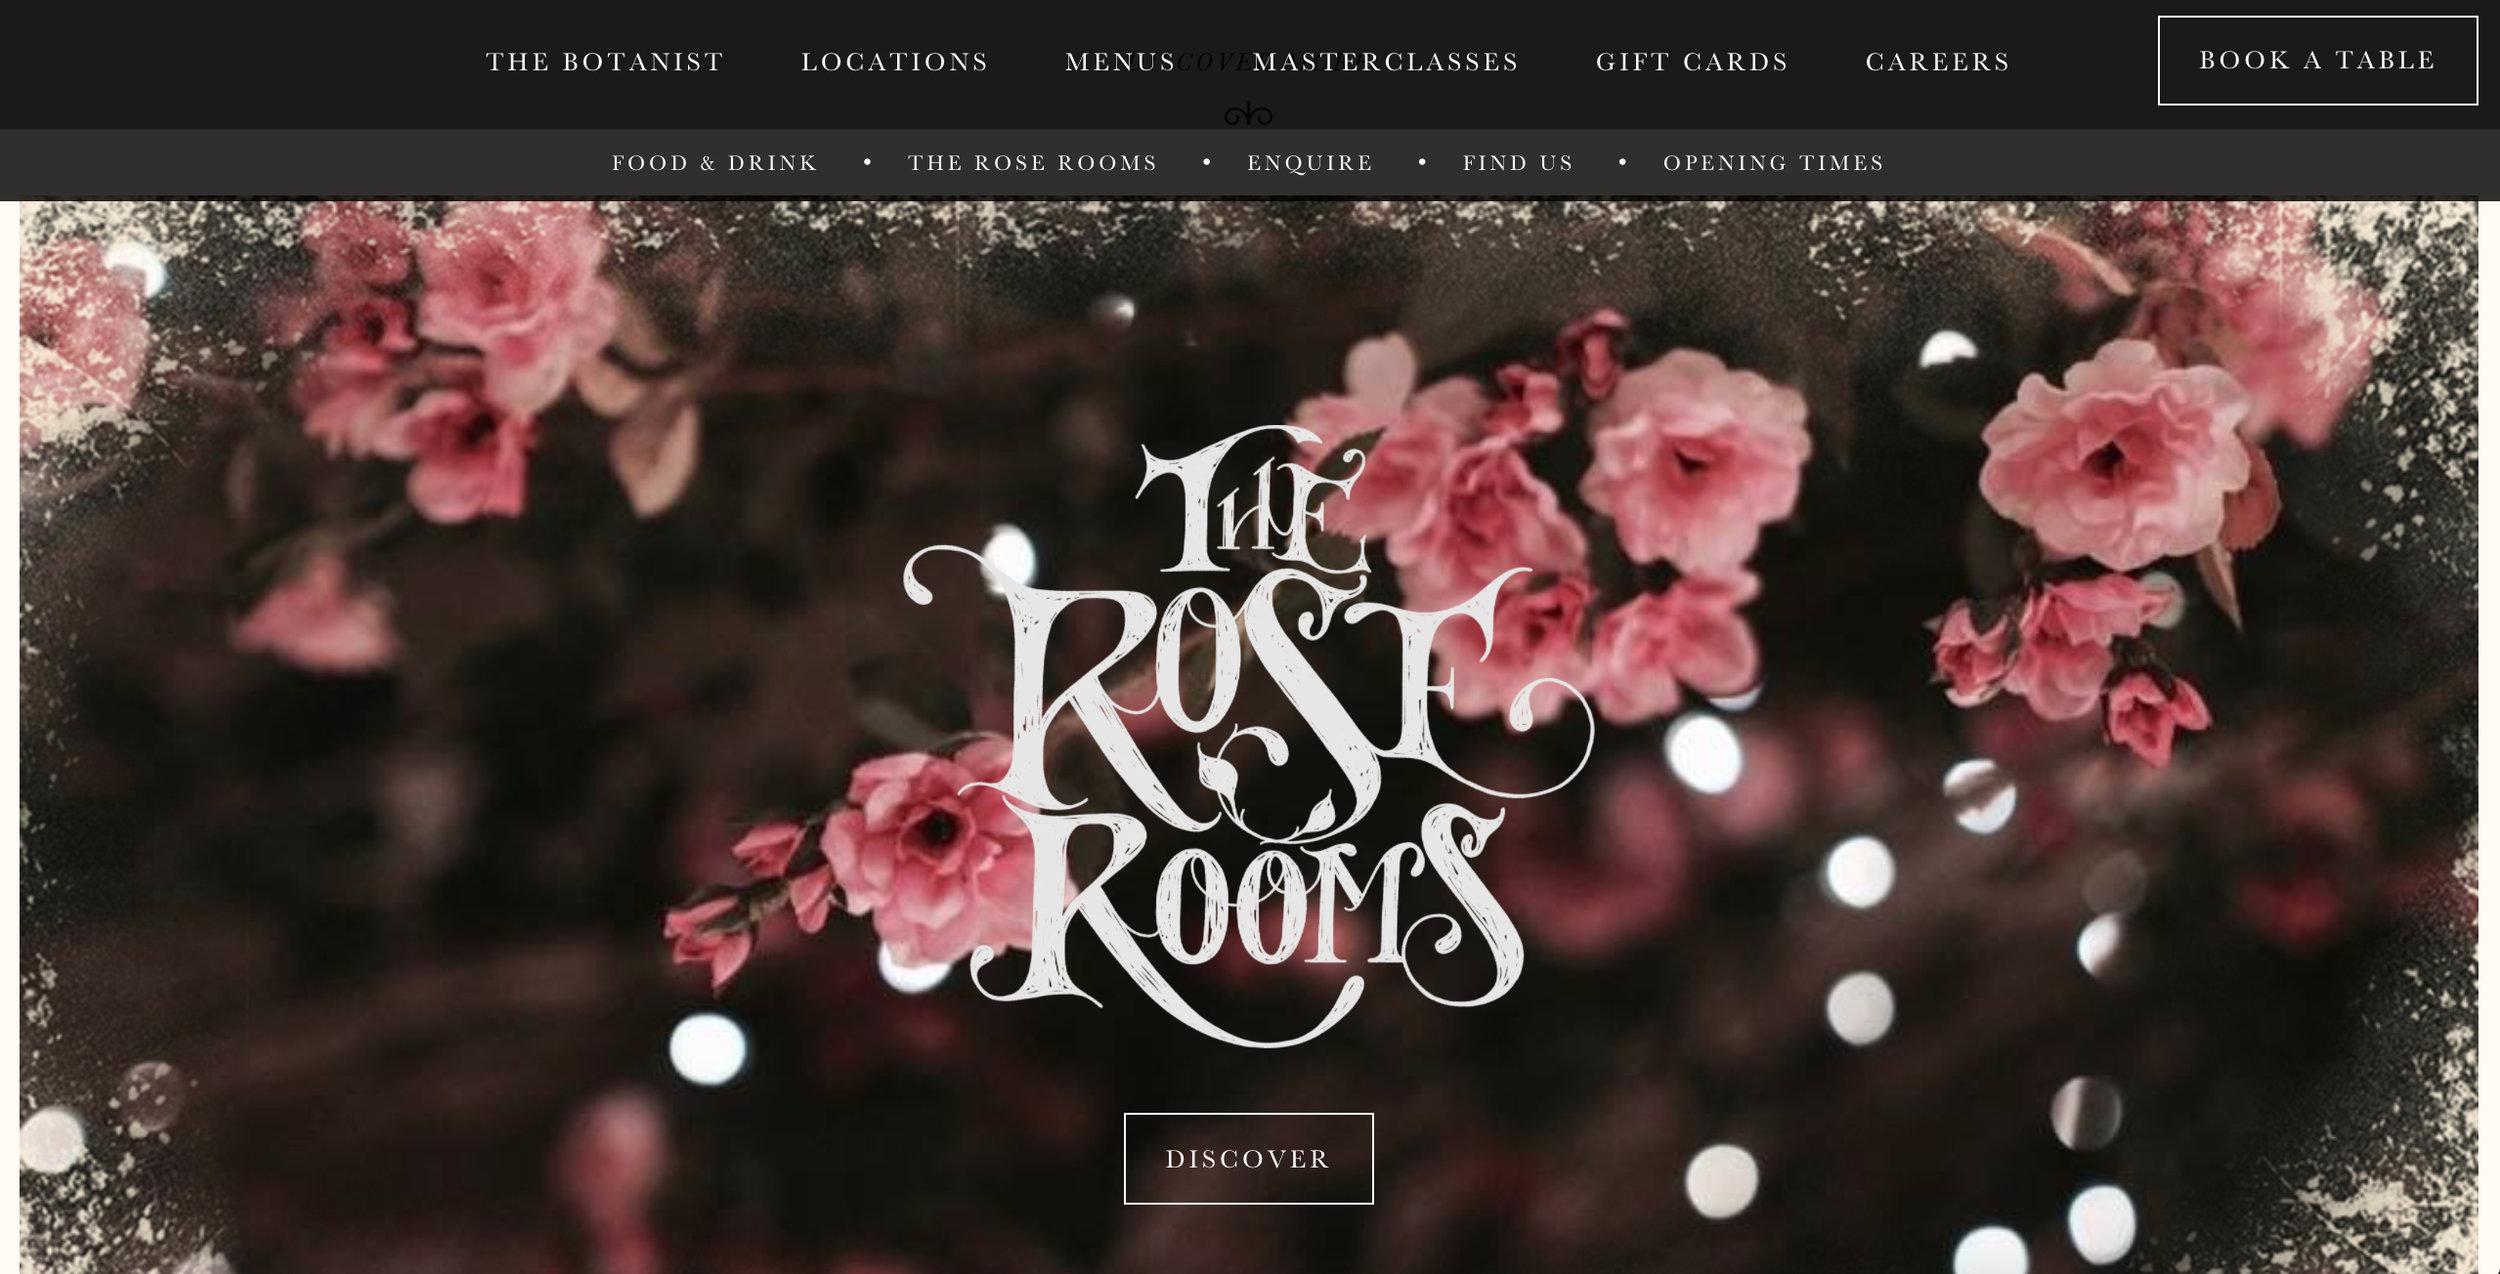 The Rose Rooms Desktop Site